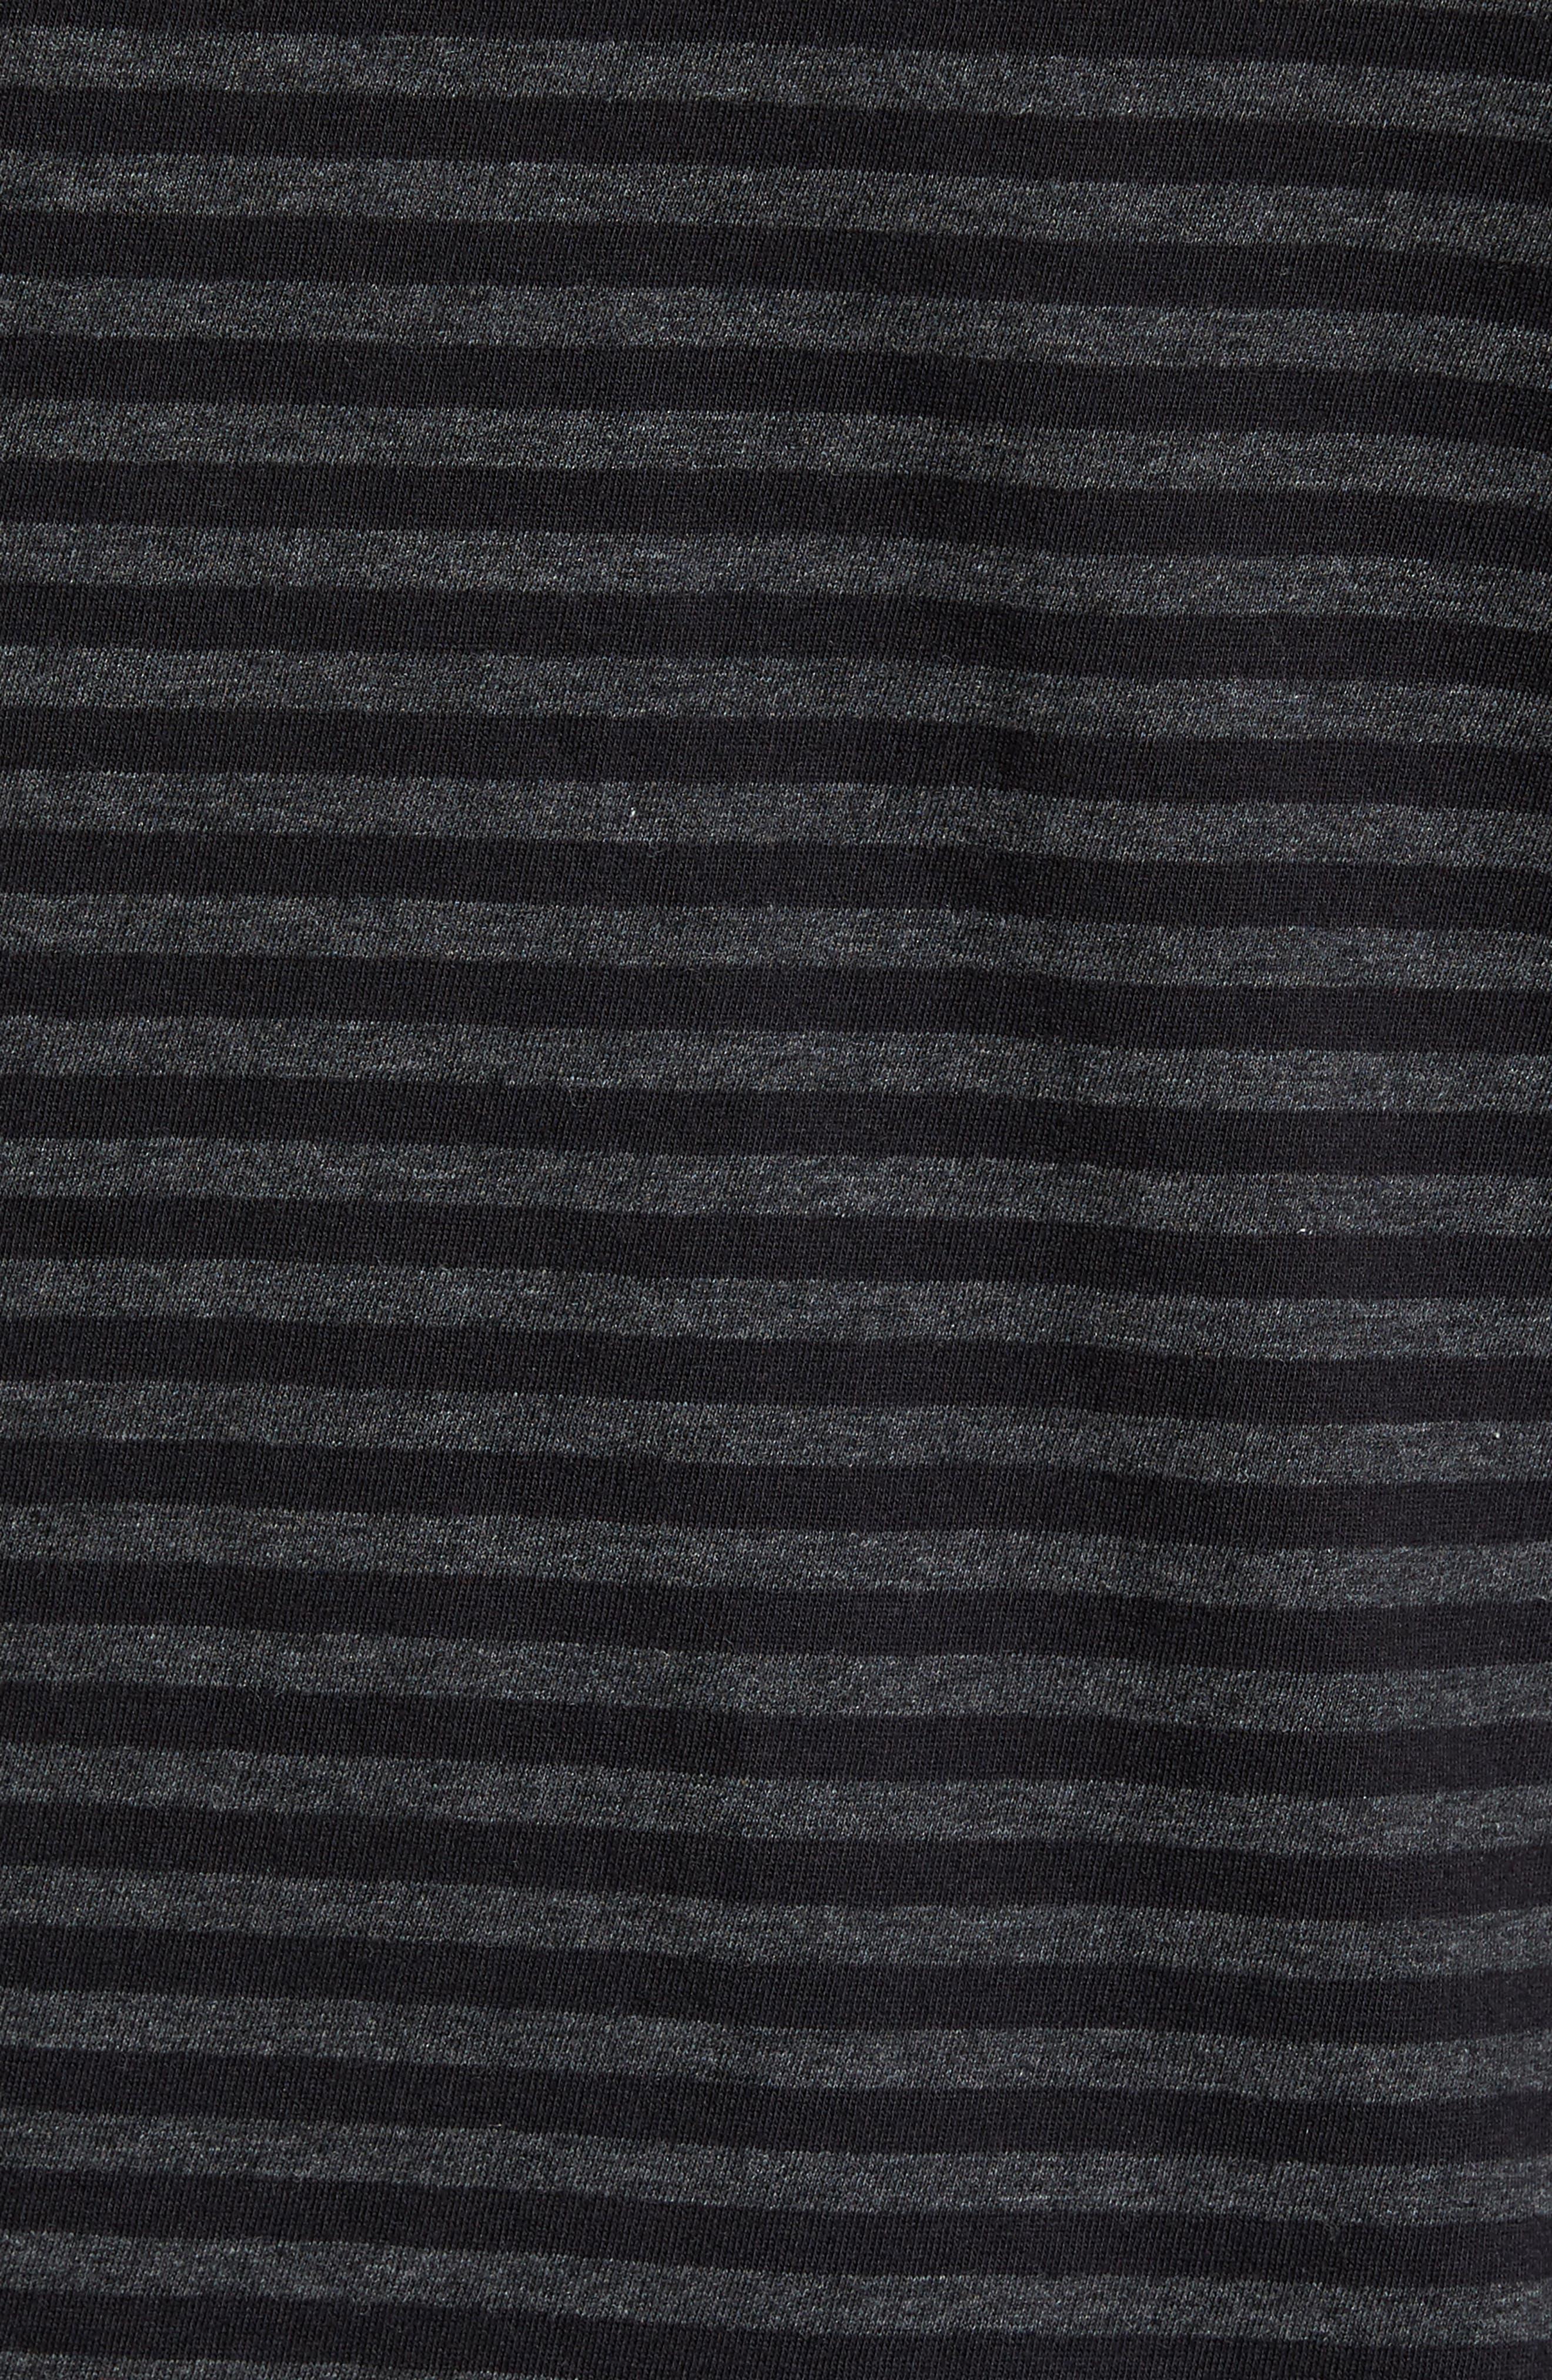 Long Sleeve Henley T-Shirt,                             Alternate thumbnail 5, color,                             Black/ Charcoal Stripe